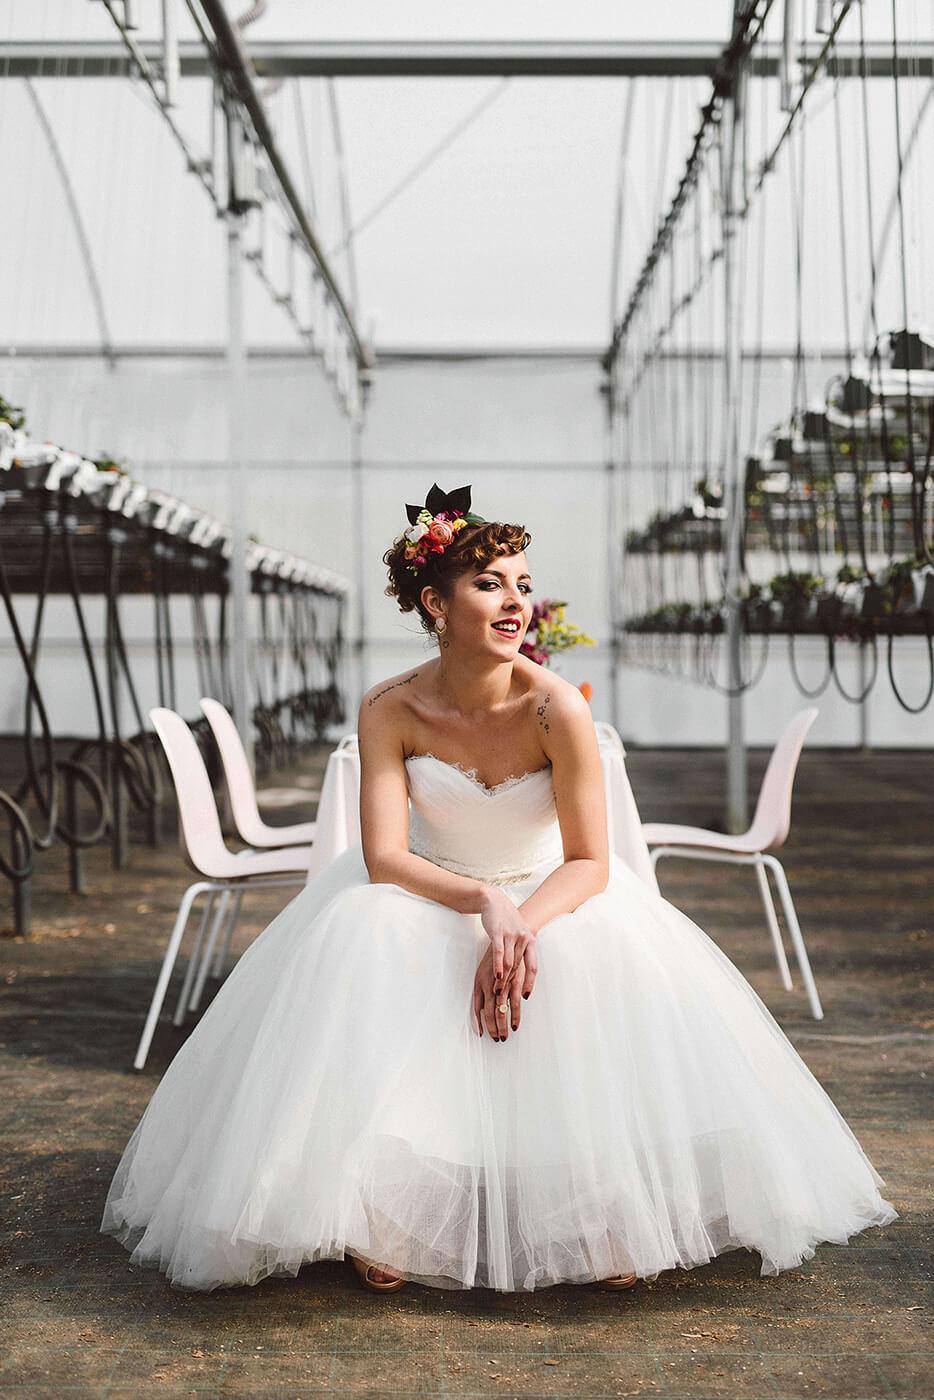 roma-organizacao-eventos-editorial-mid-century-modern-wedding-in-a-strawberry-field-17